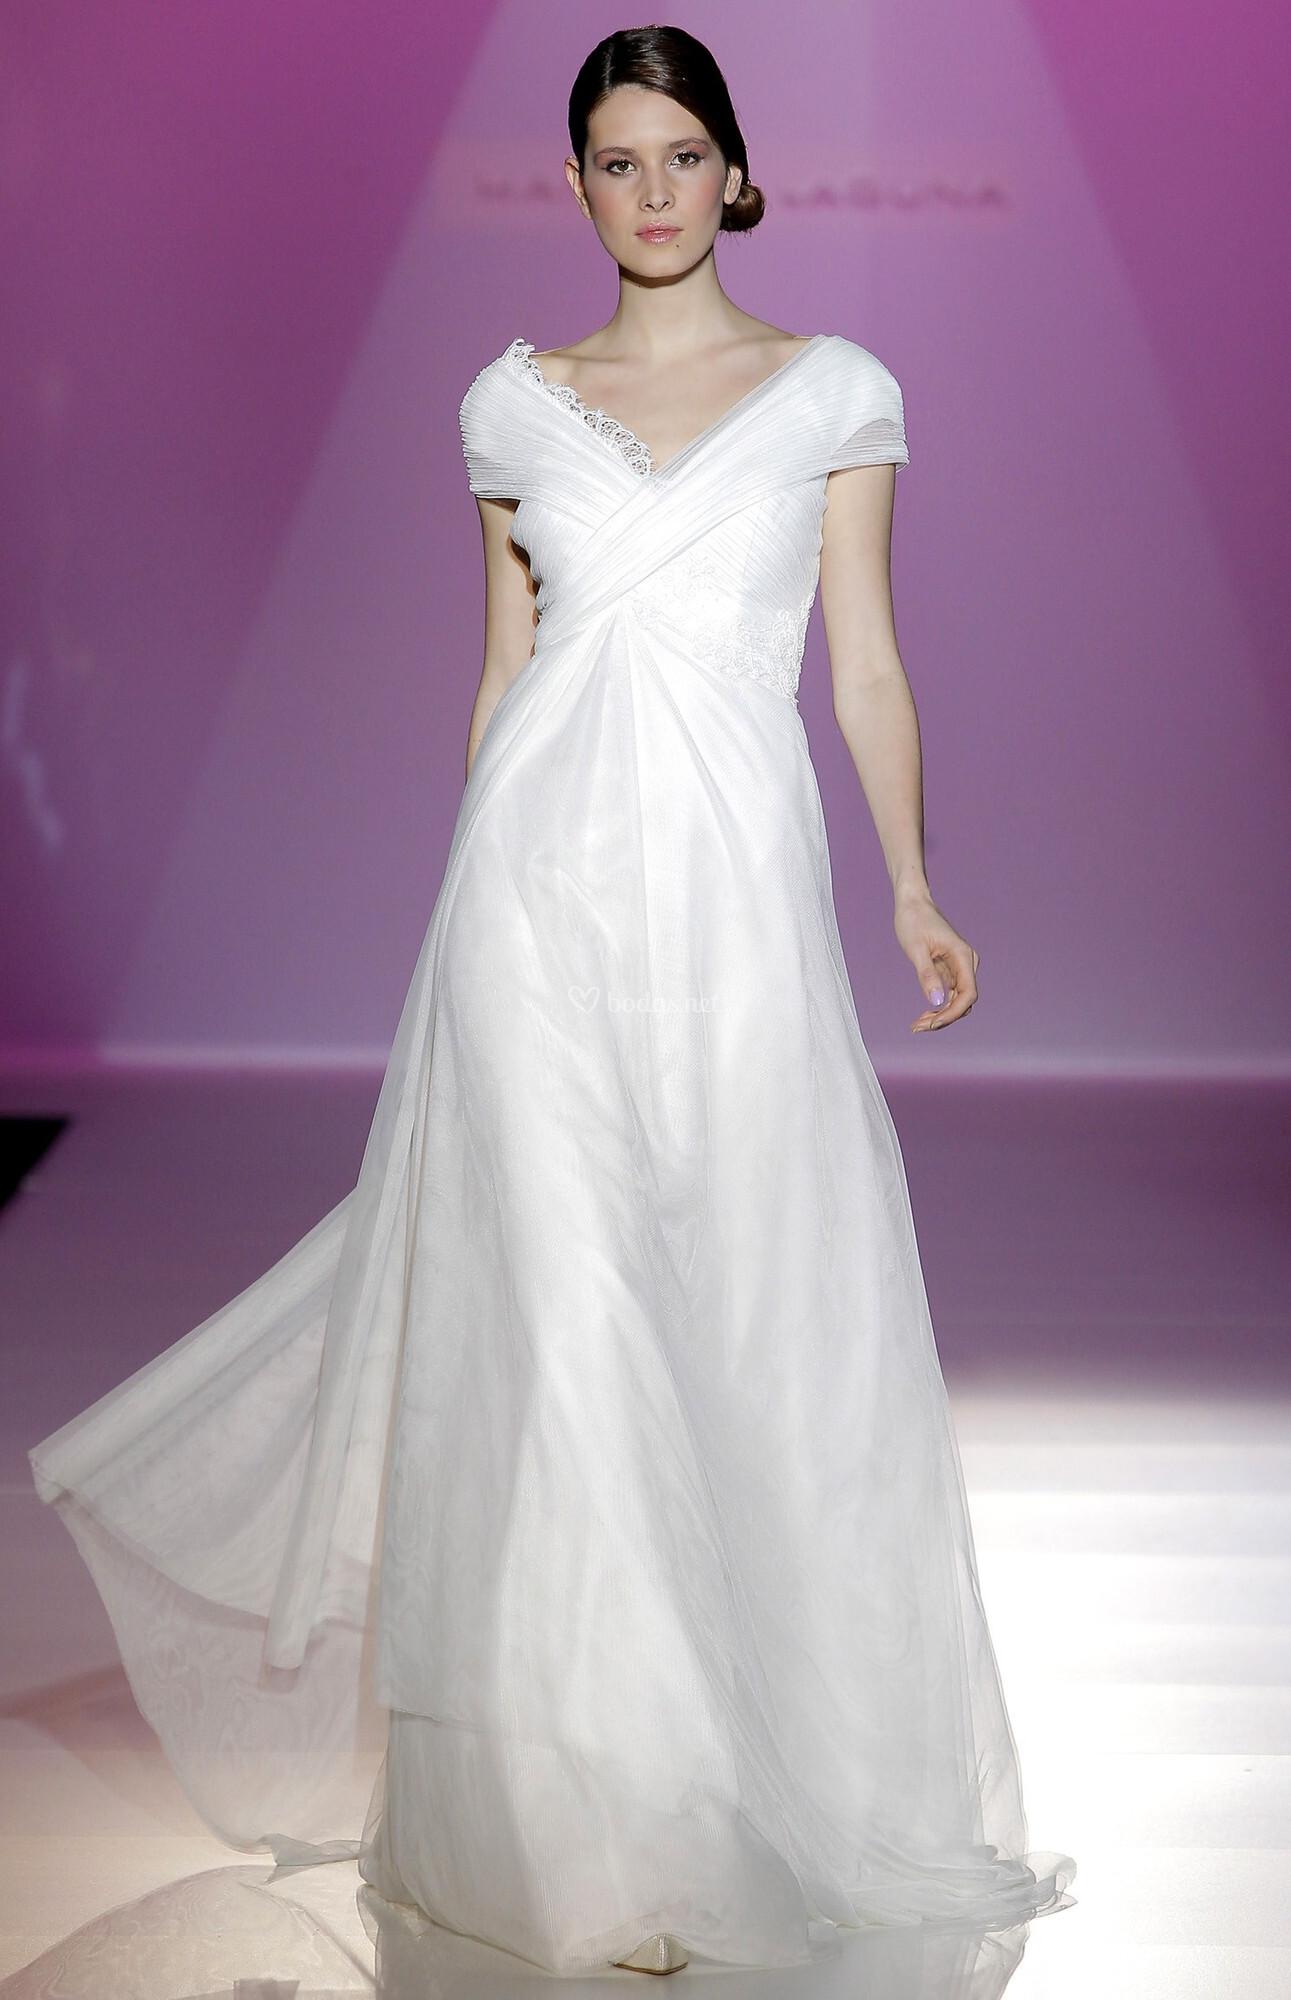 Magnífico Vestido De Novia Saco De Yute Foto - Vestido de Novia Para ...